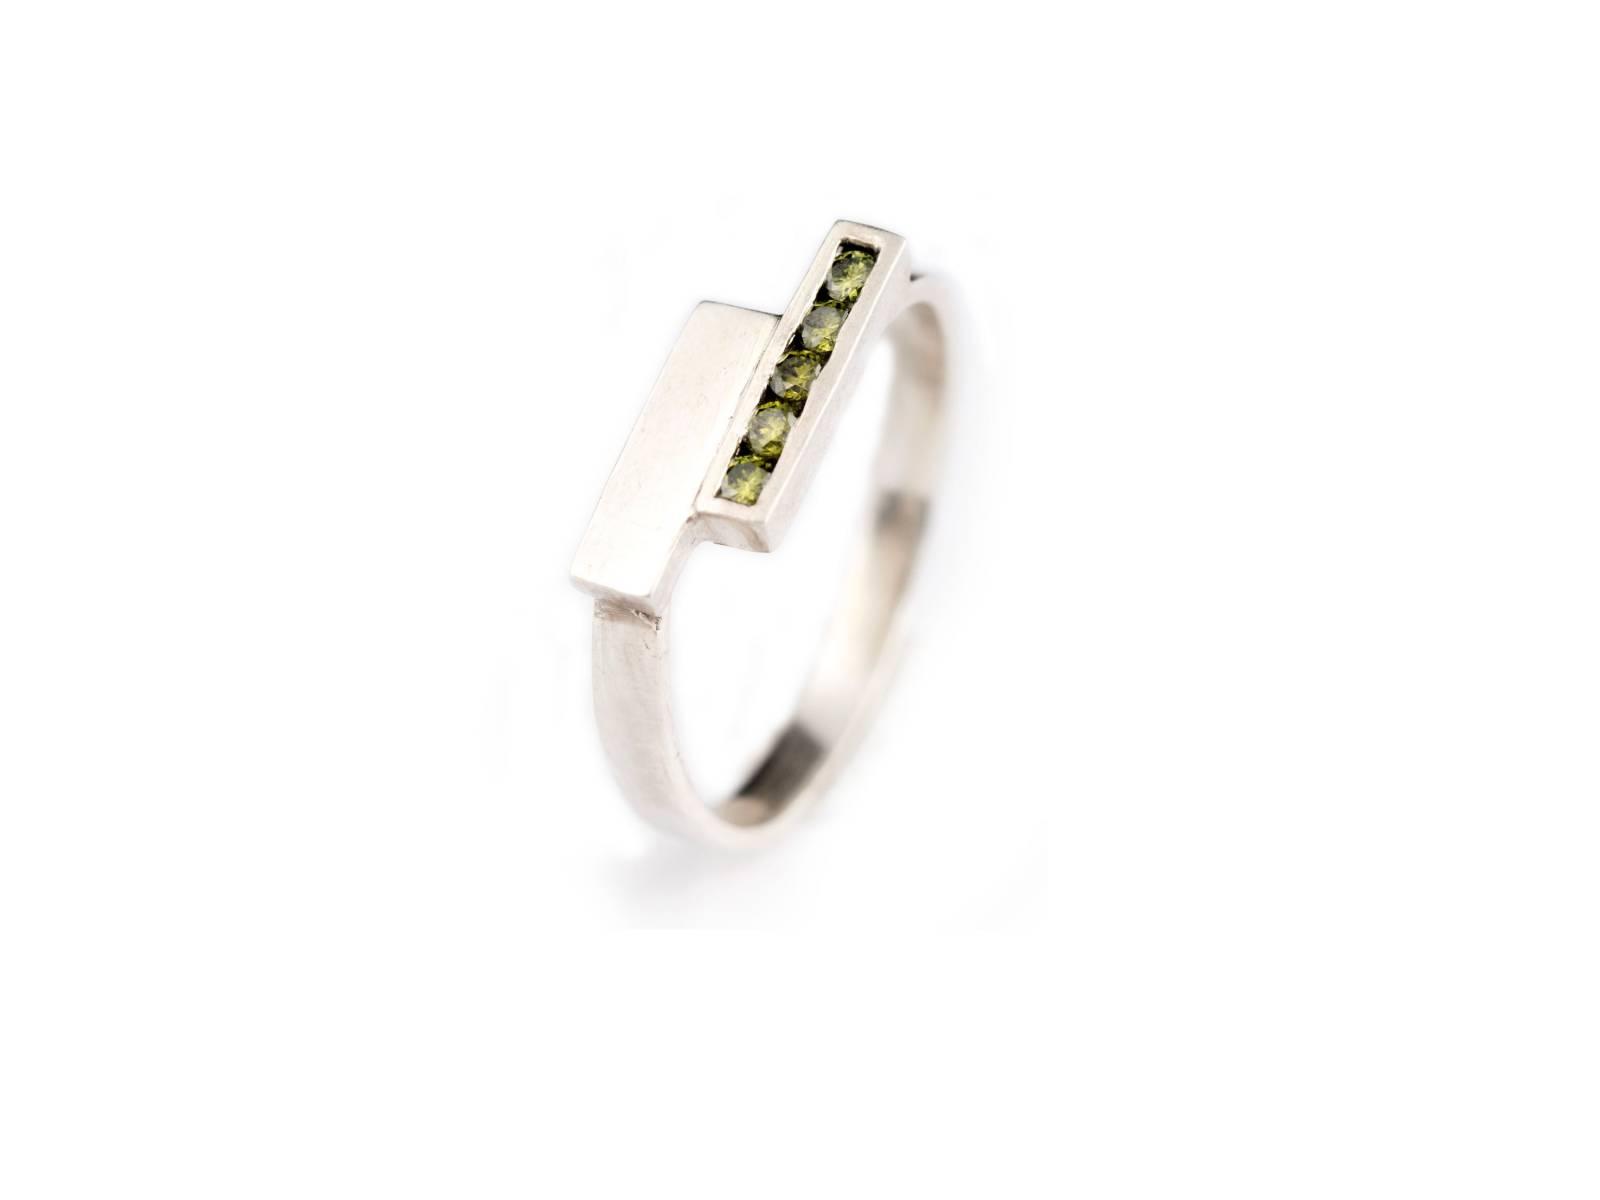 LUX_sakura lux 18k wit goud olive diamanten